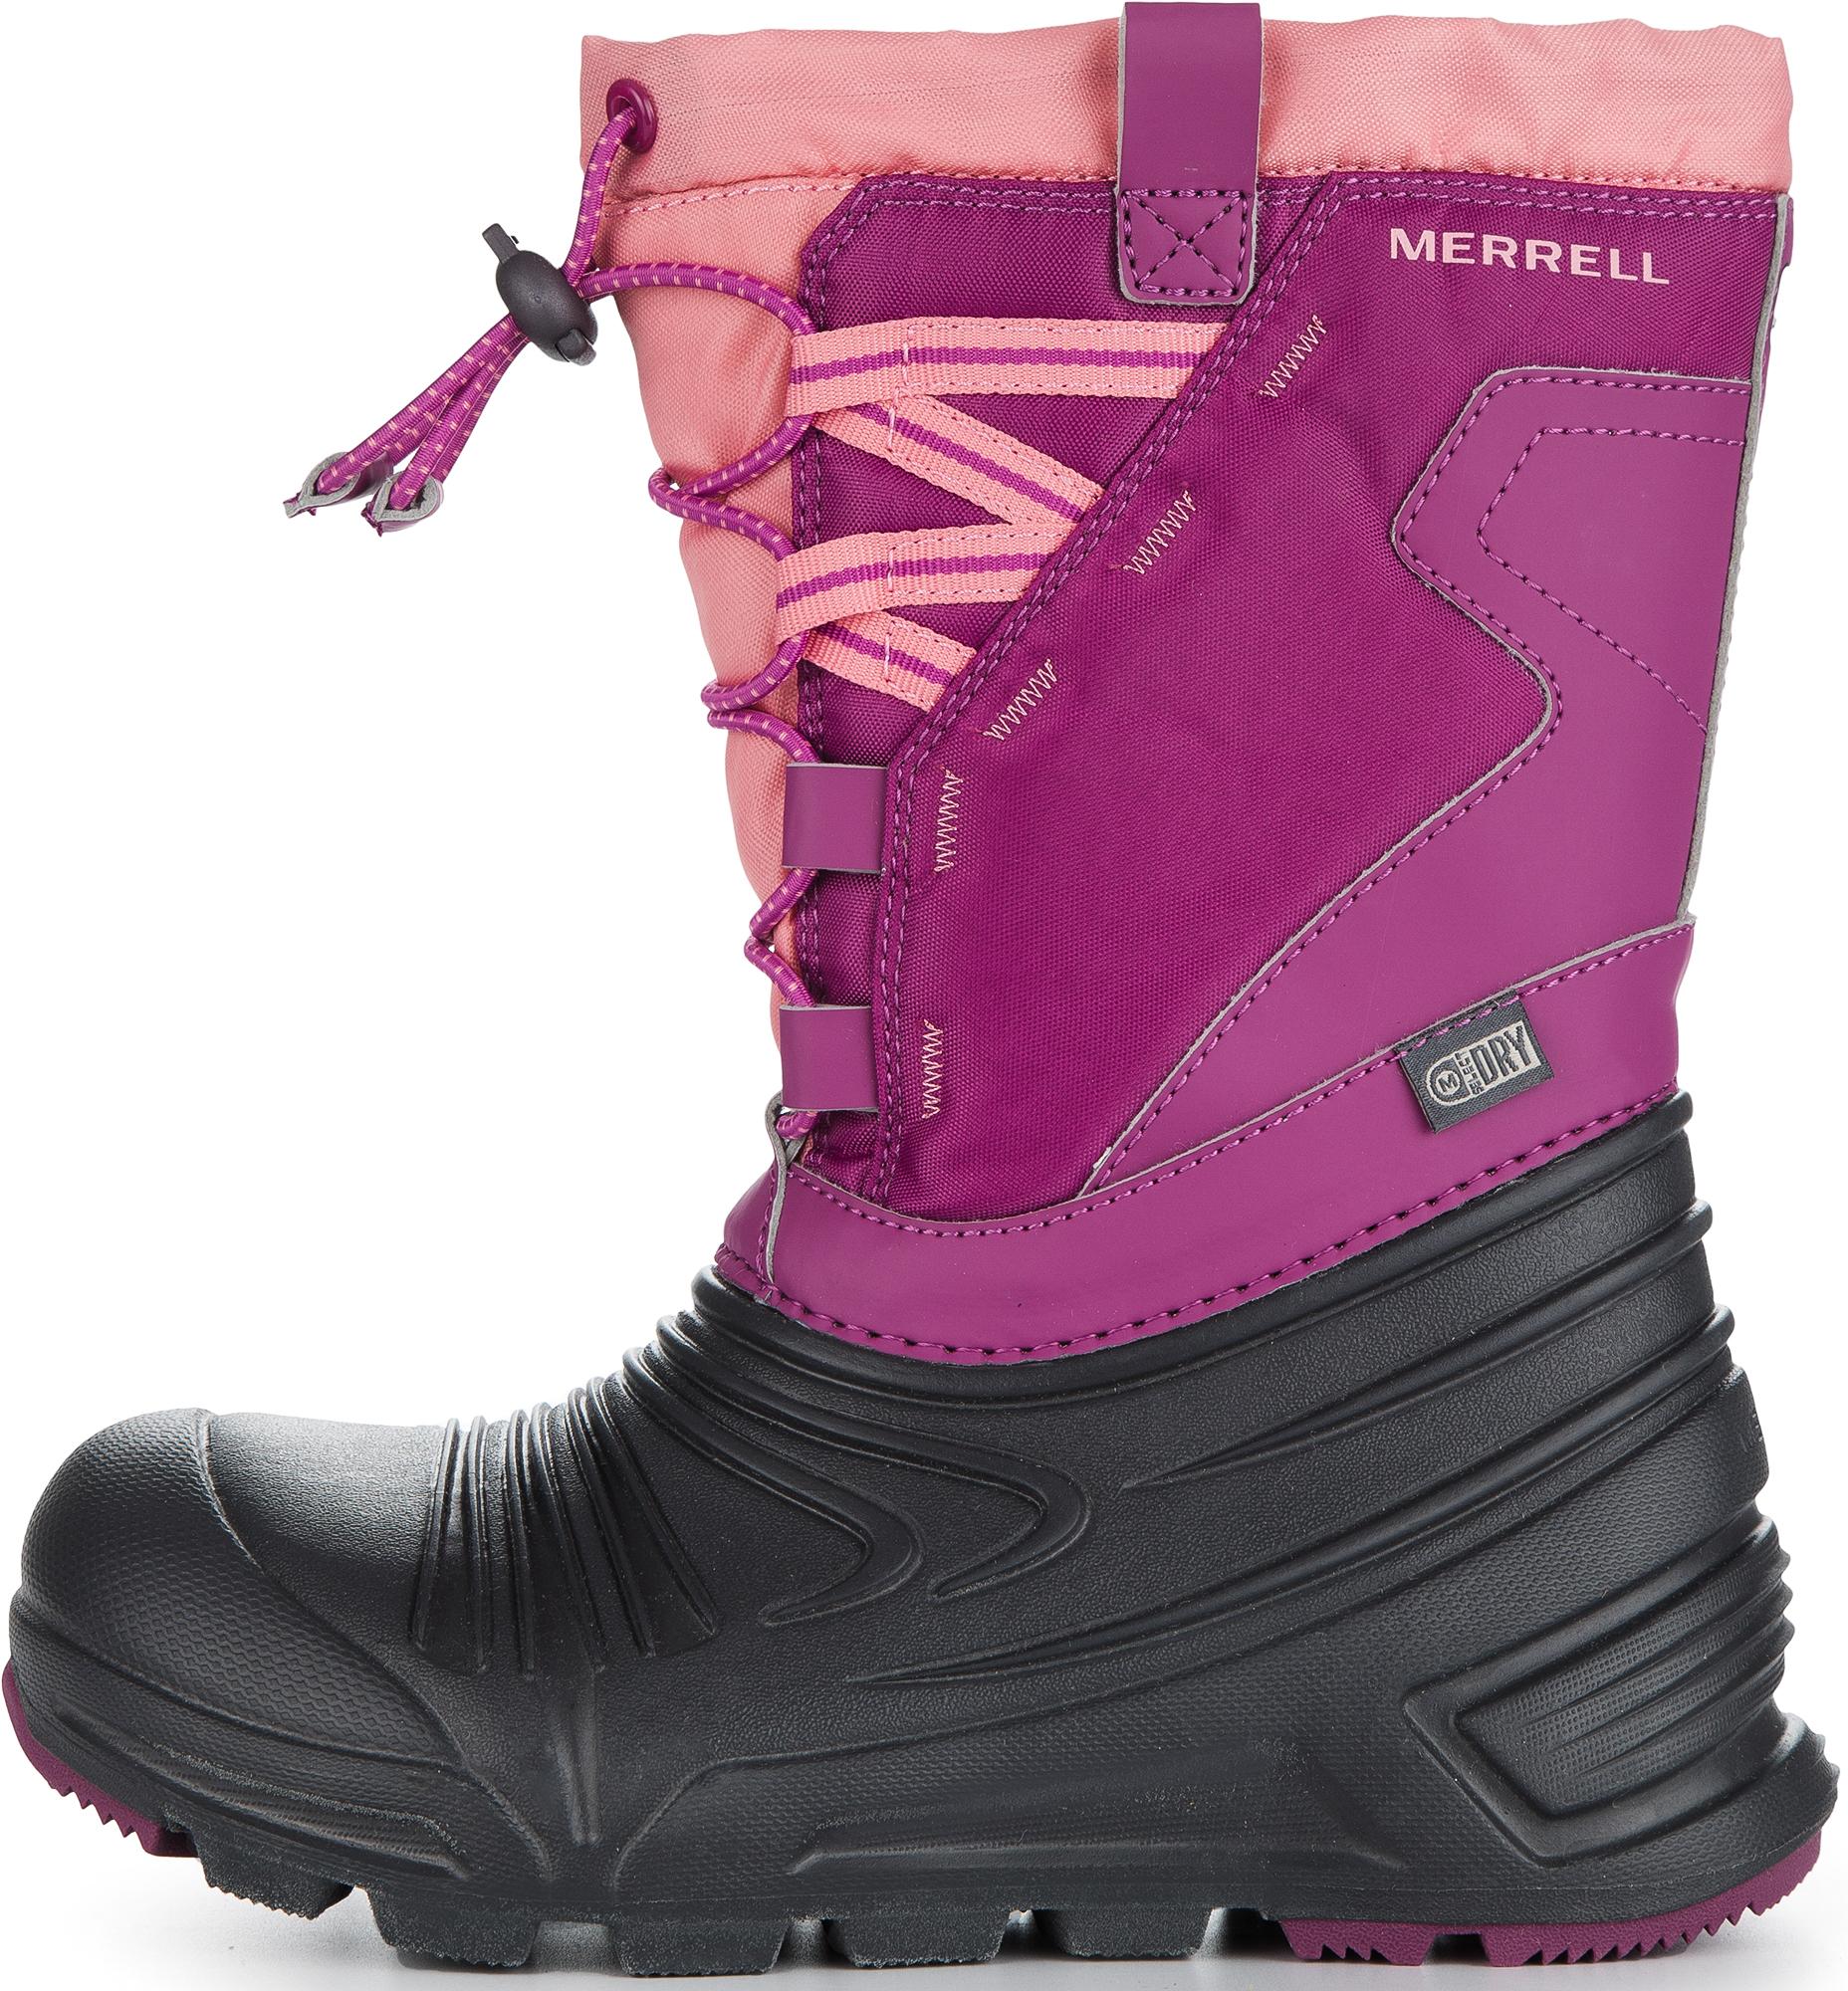 Merrell Ботинки утепленные для девочек Merrell M-Snoqstlite 2.0, размер 30 ботинки для девочки merrell m moab fst polar mid a c wtrpf цвет черный розовый mk159178 размер 13 30